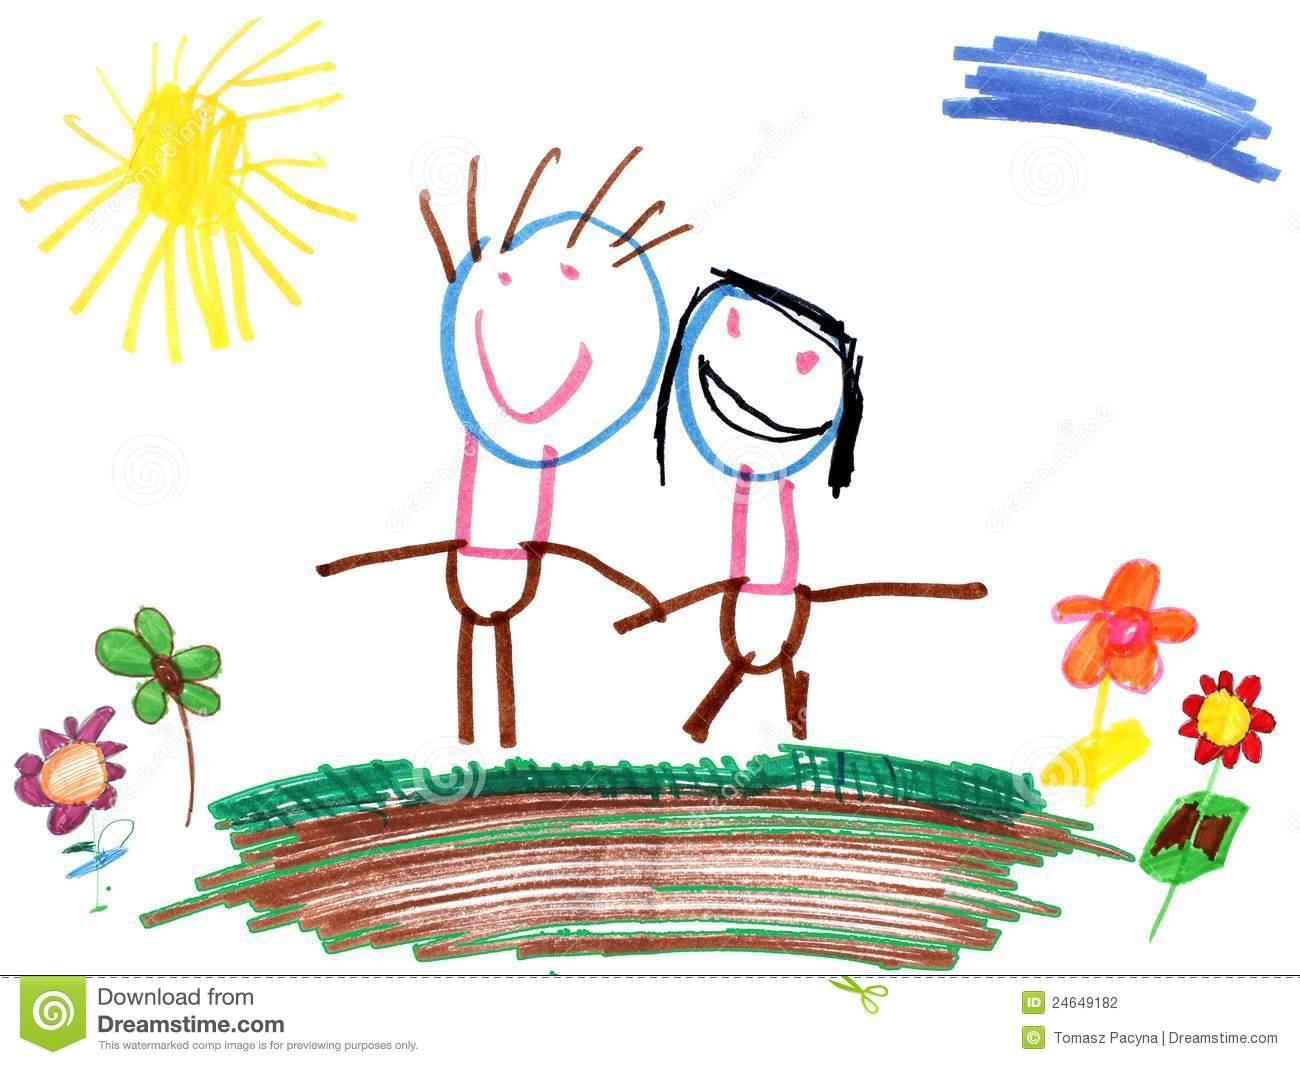 child-drawing-family-24649182.jpg